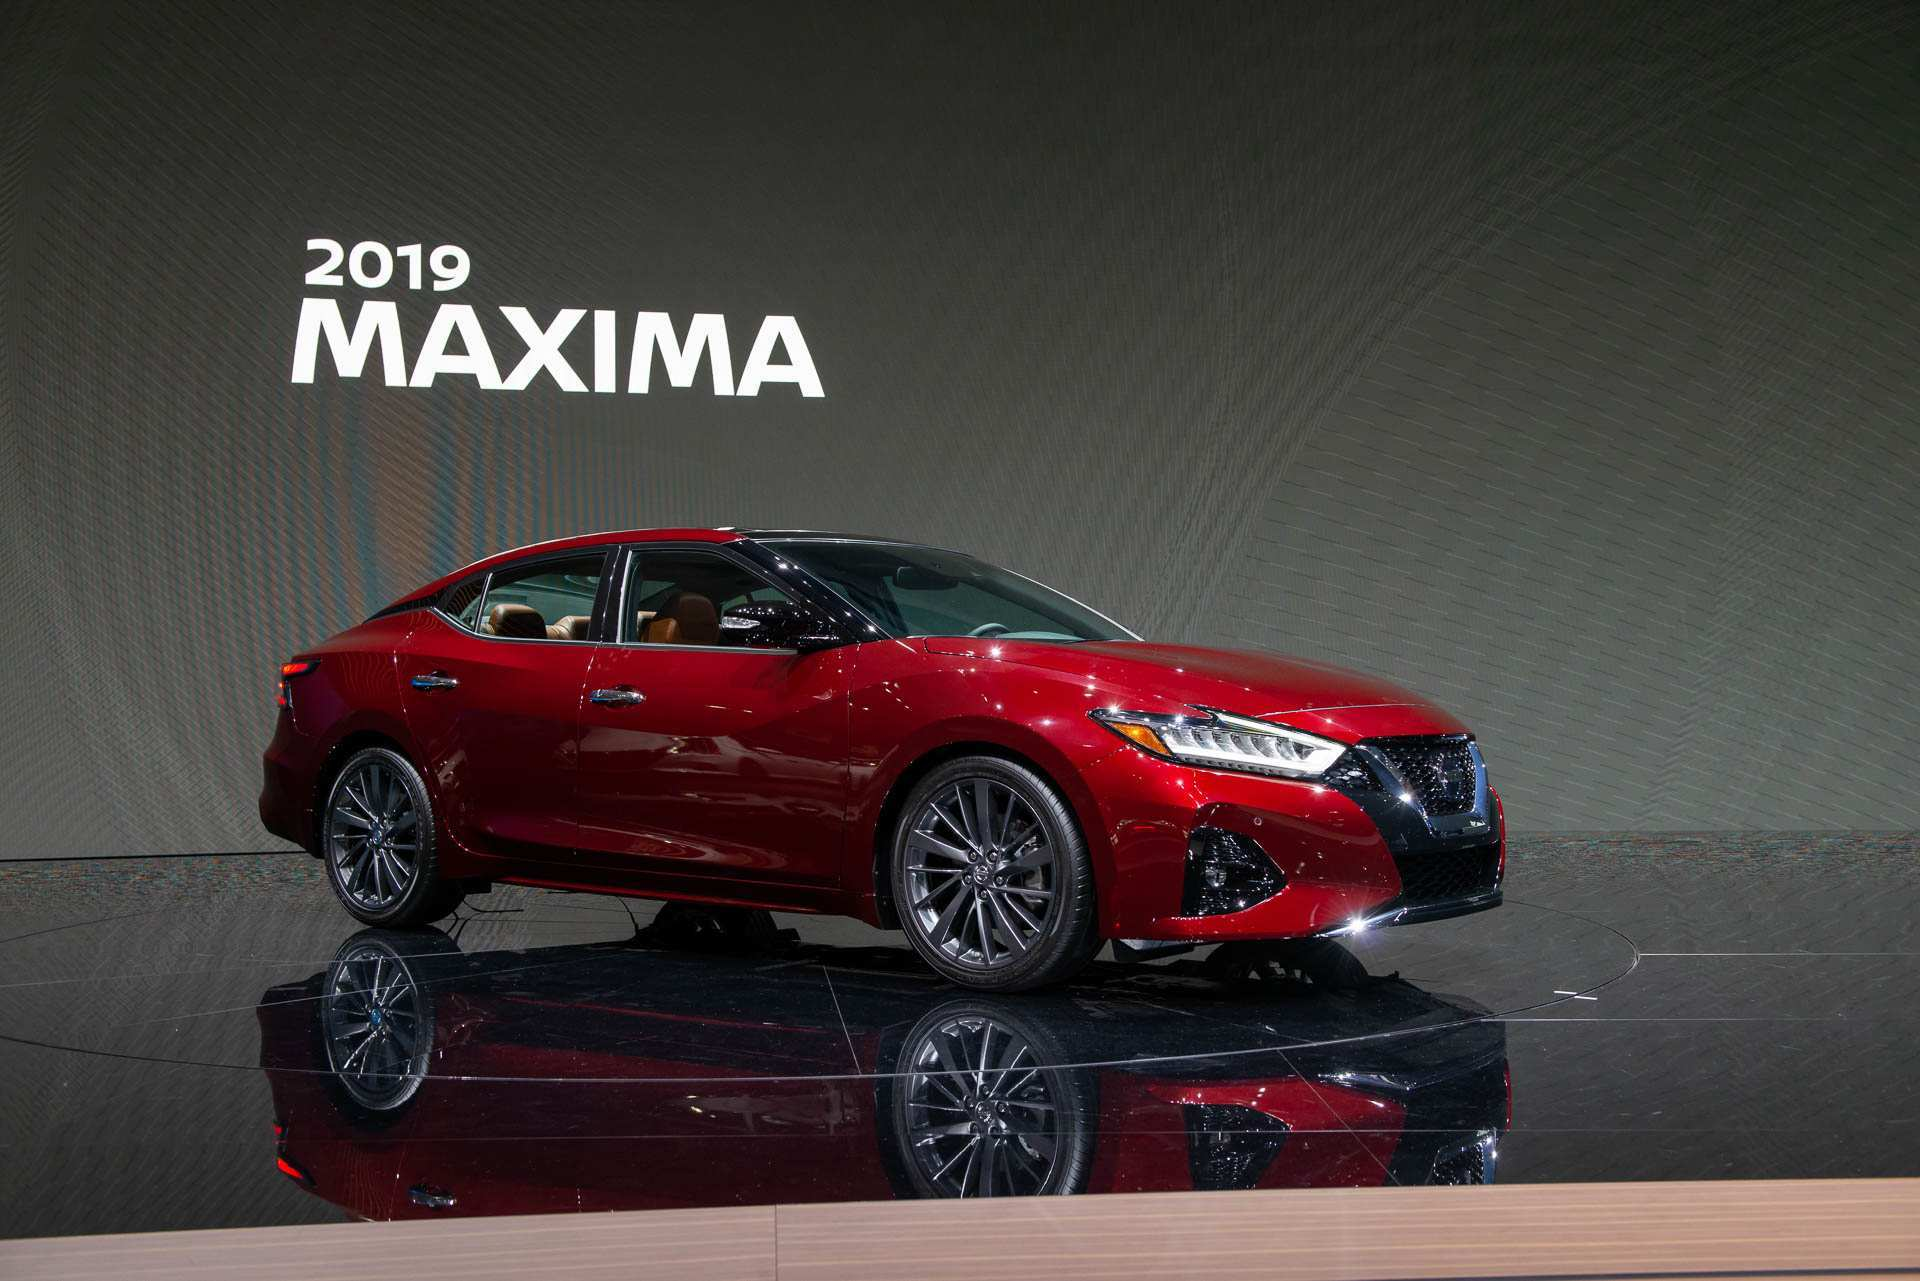 71 New Nissan Maxima 2020 Exterior with Nissan Maxima 2020